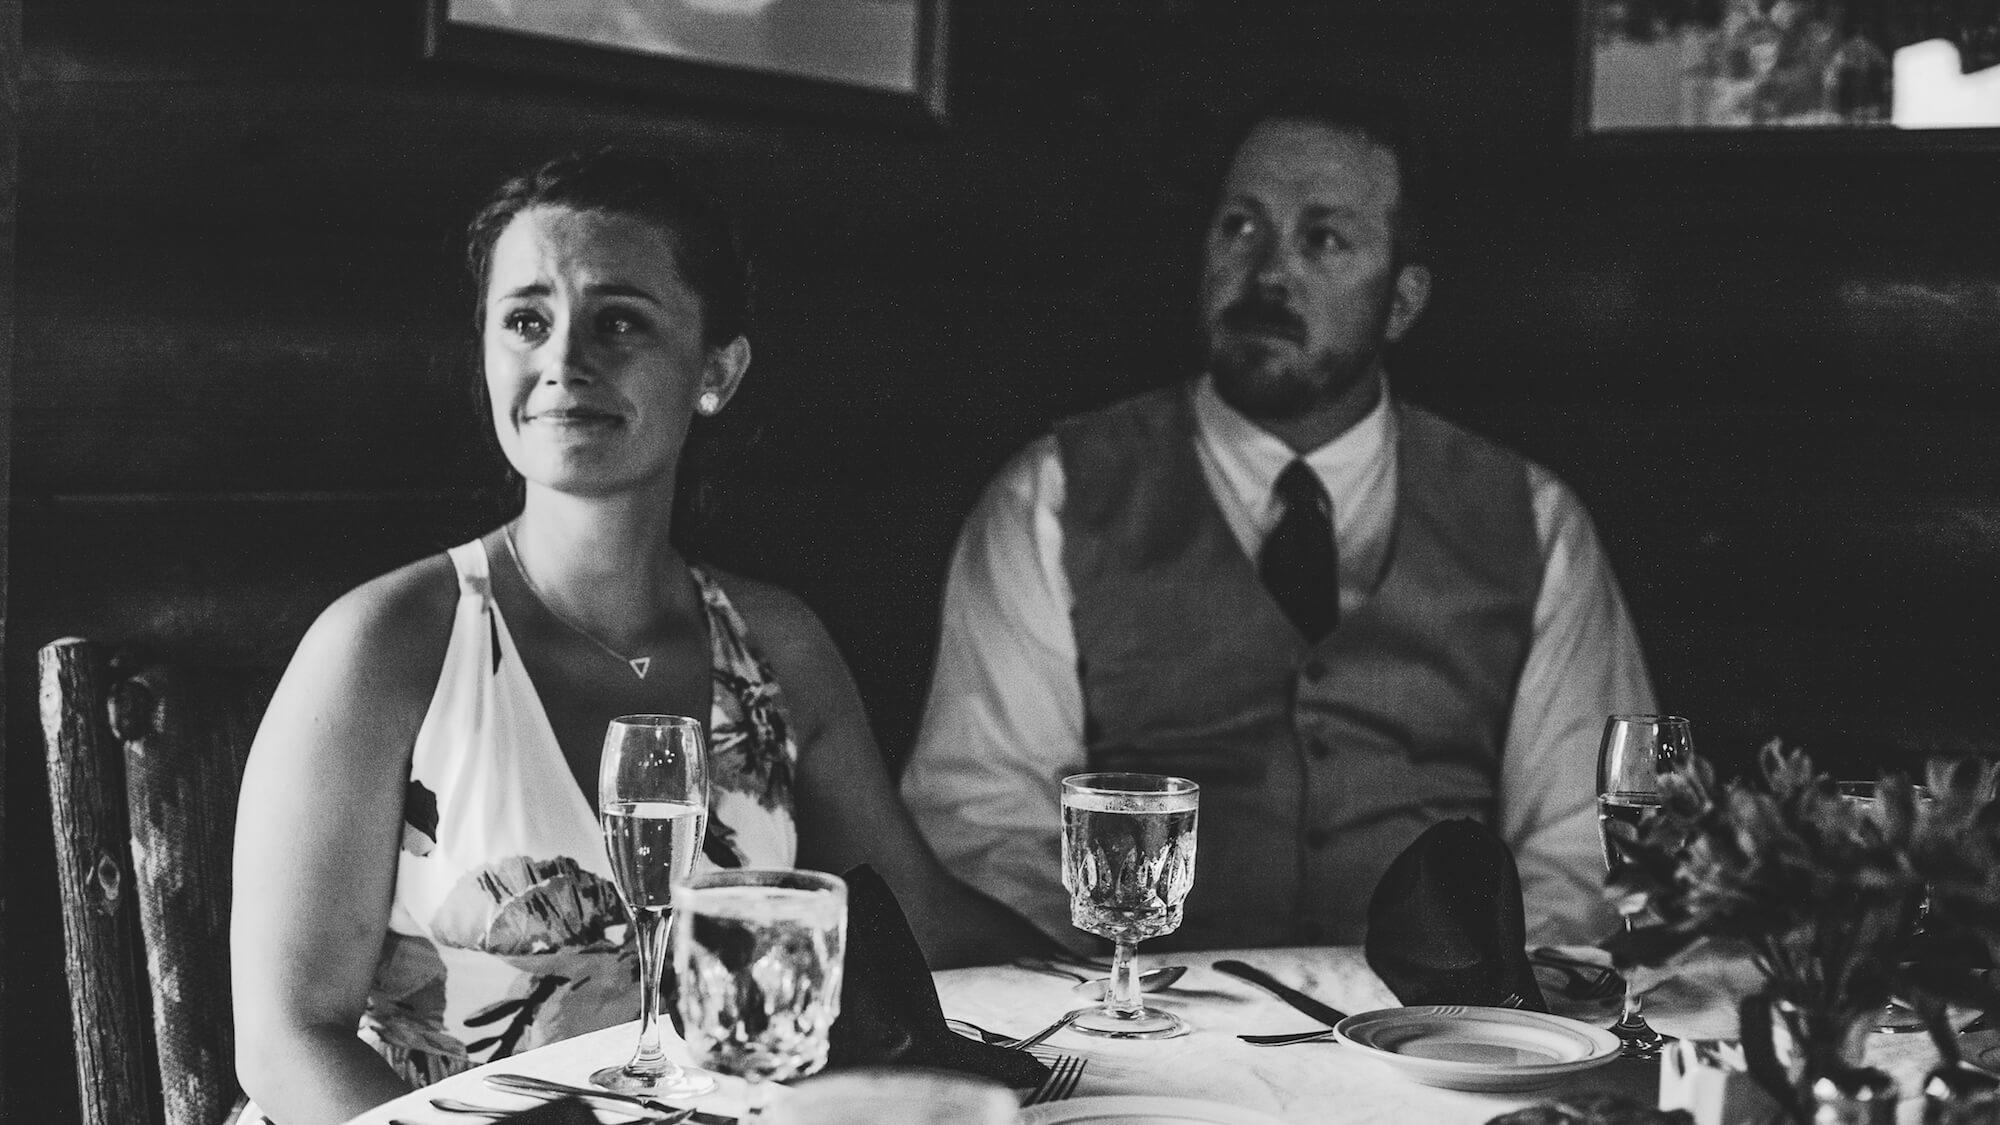 engle-olson-maddy-pat-mn-wedding-photography-29.jpg